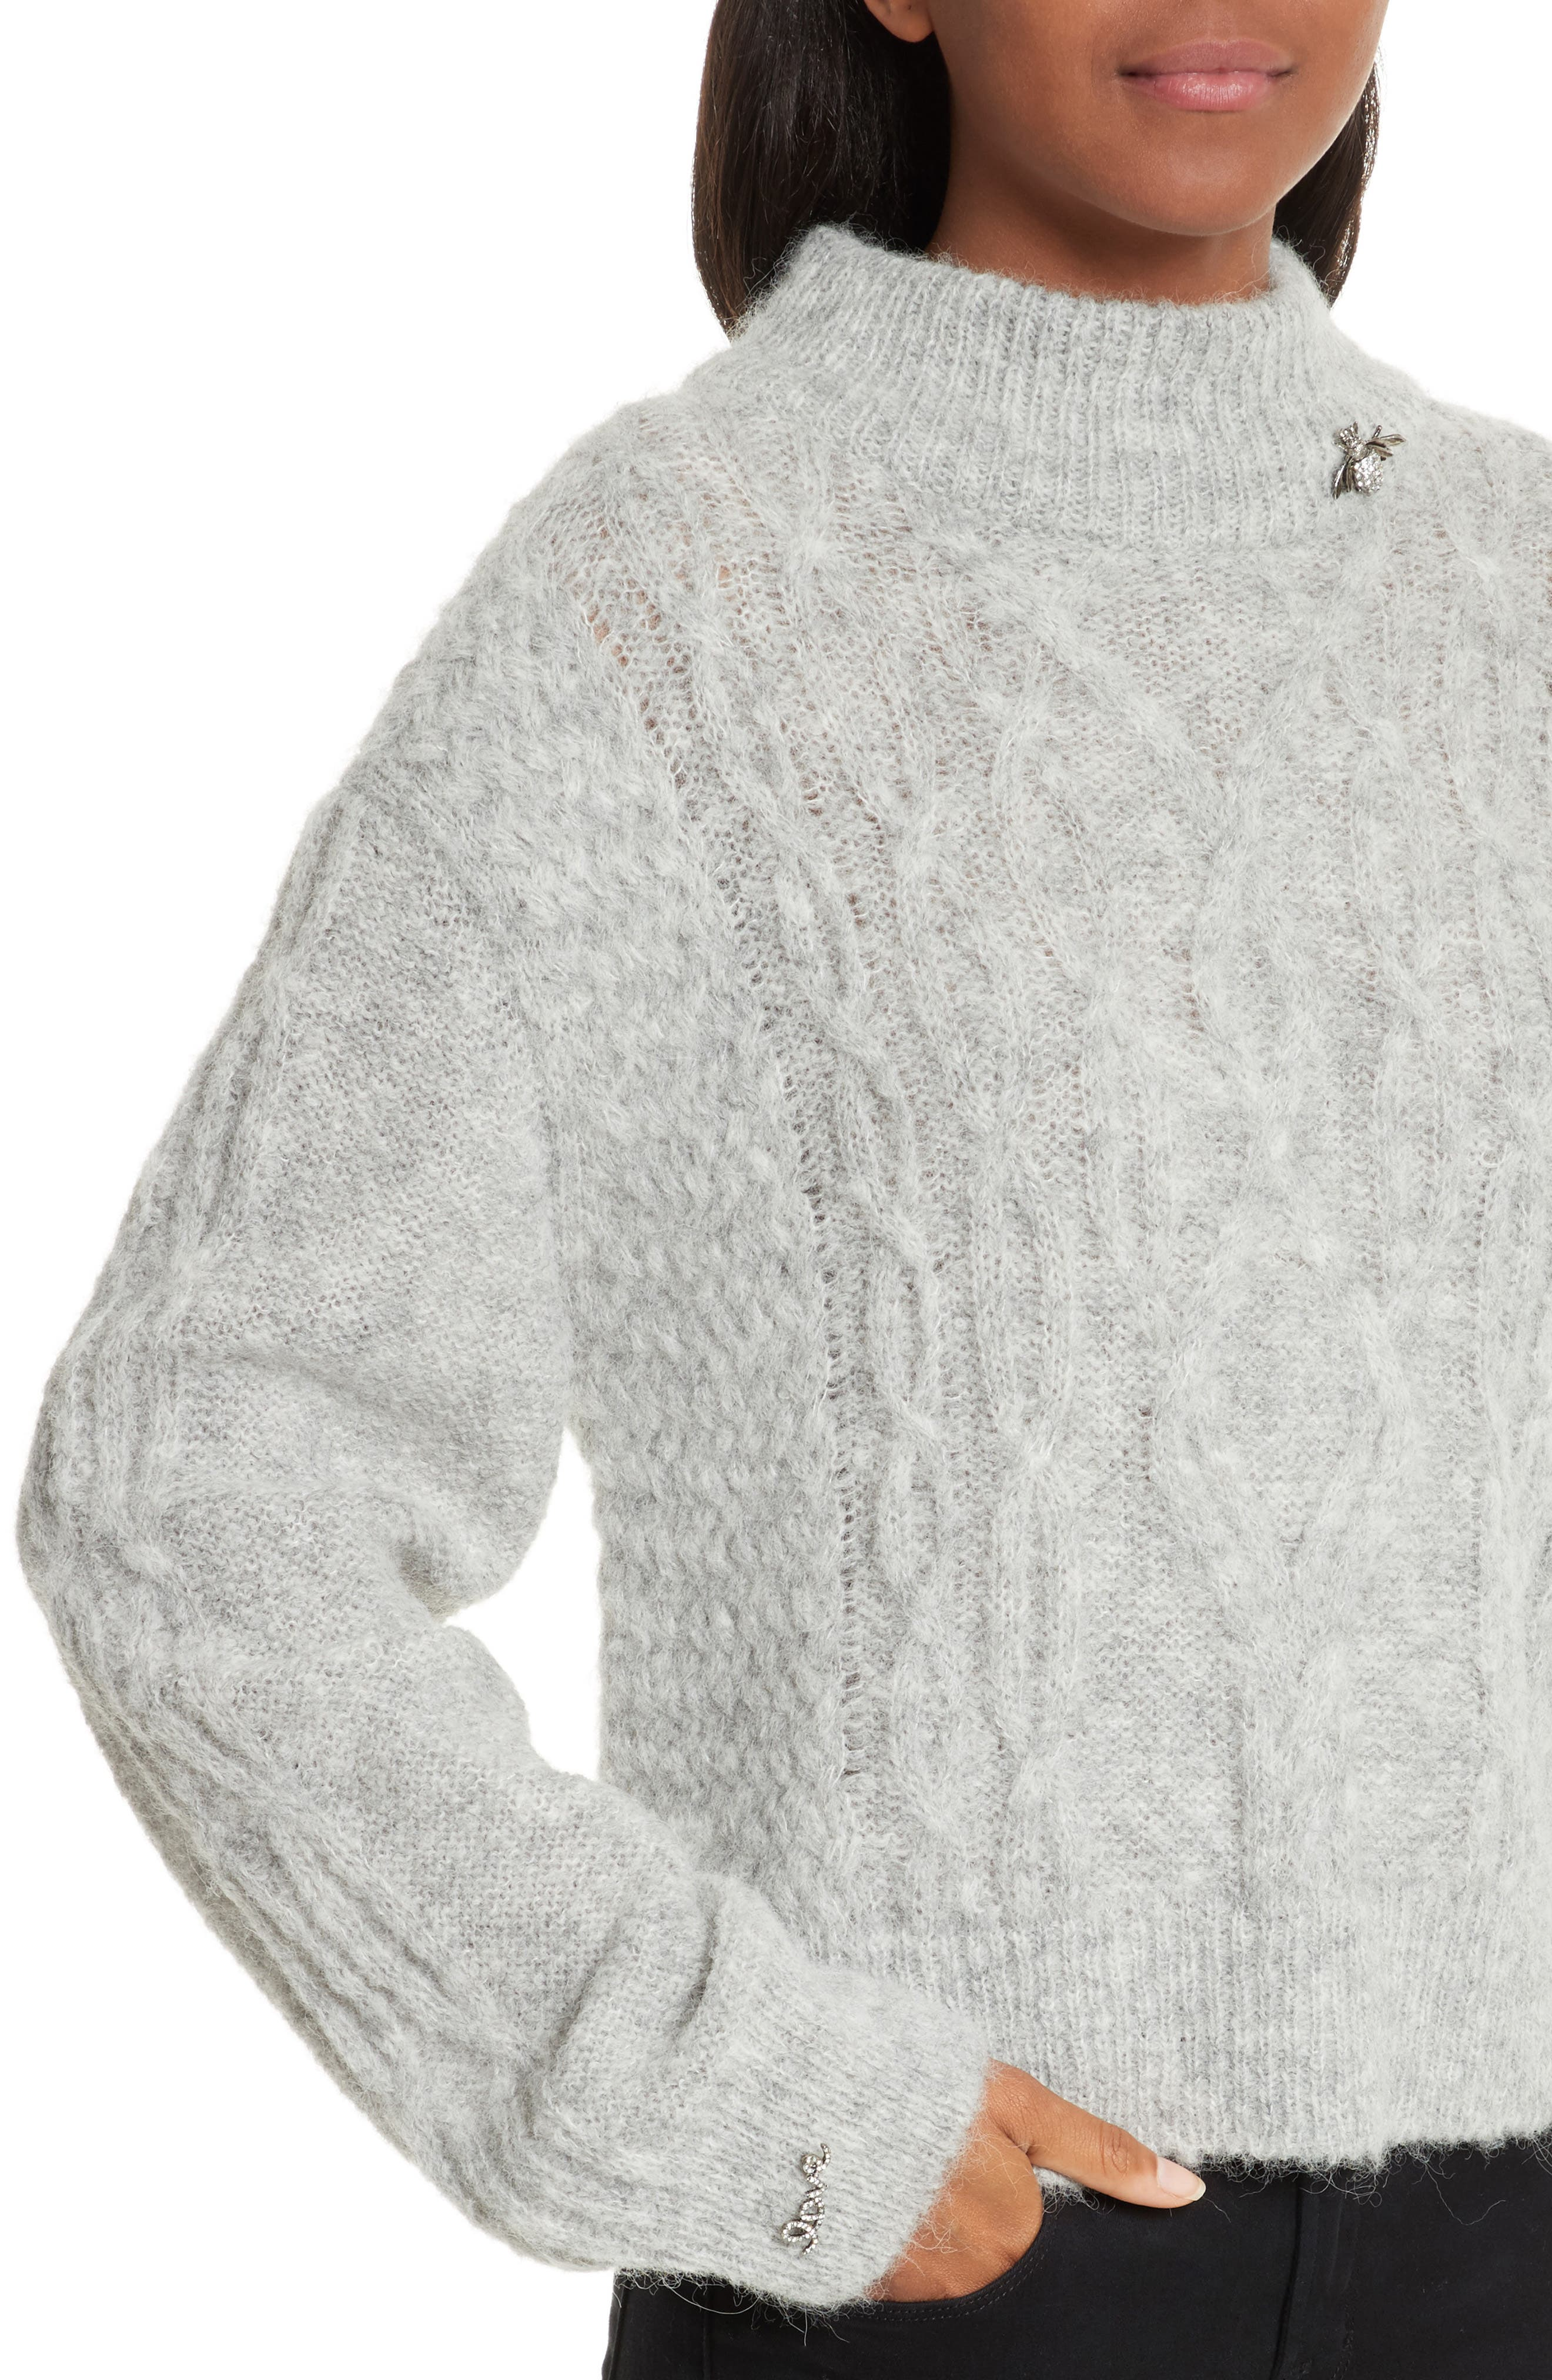 Garlan Mock Neck Sweater,                             Alternate thumbnail 4, color,                             051